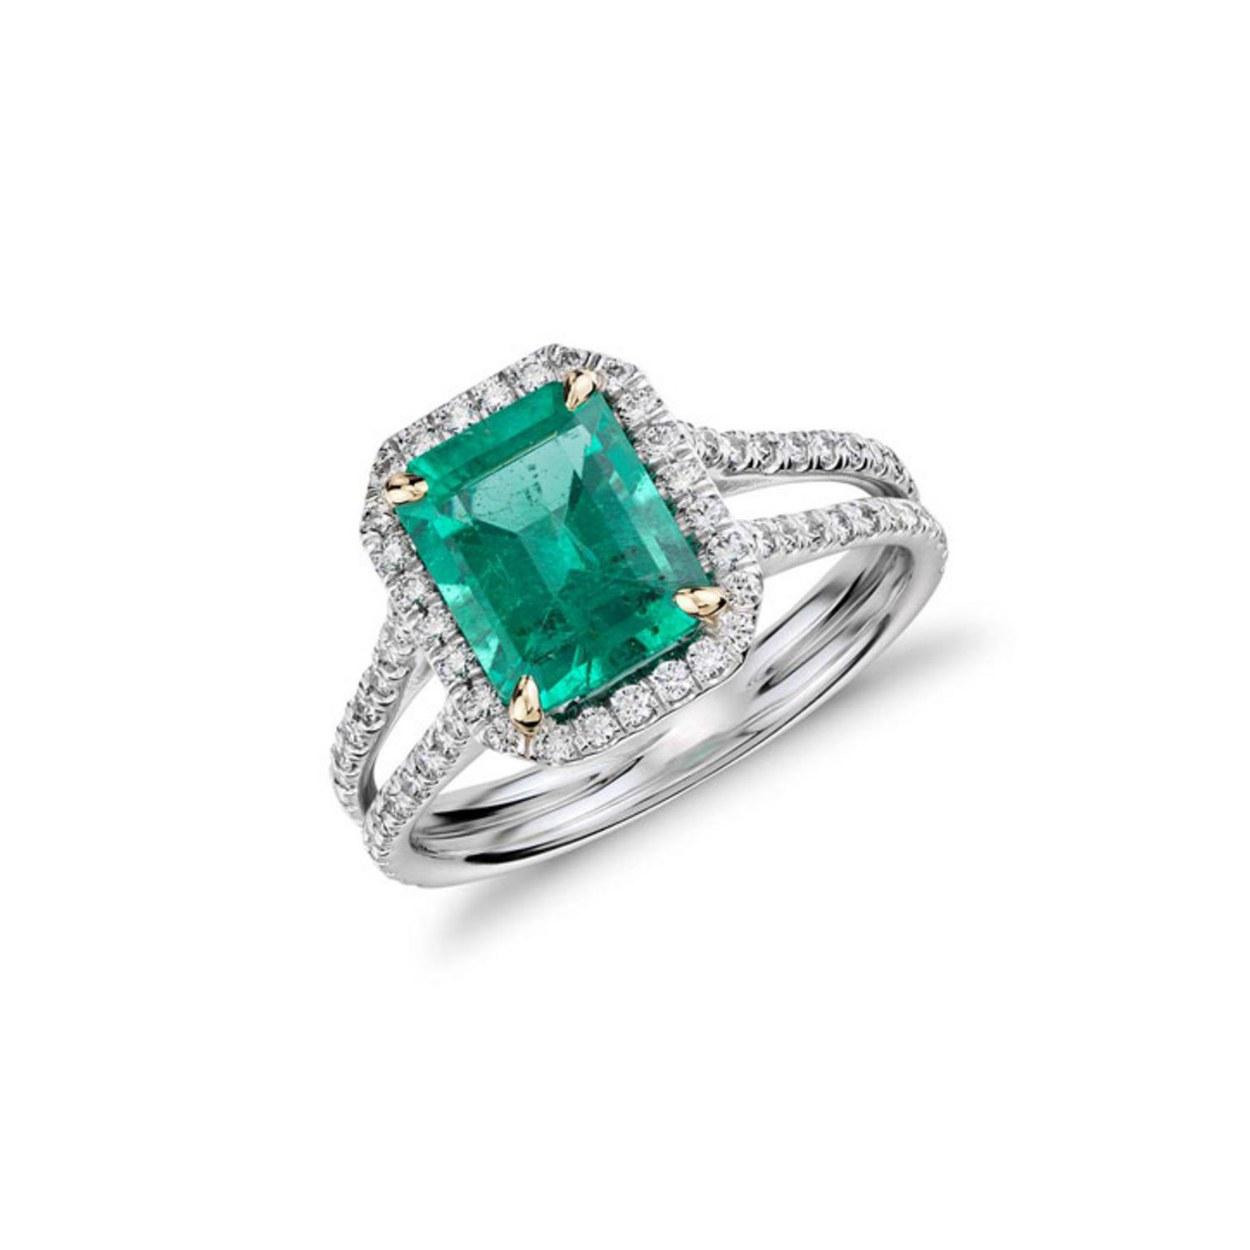 Colored Stones: Basil 5 Diamond Wedding Ring At Websimilar.org